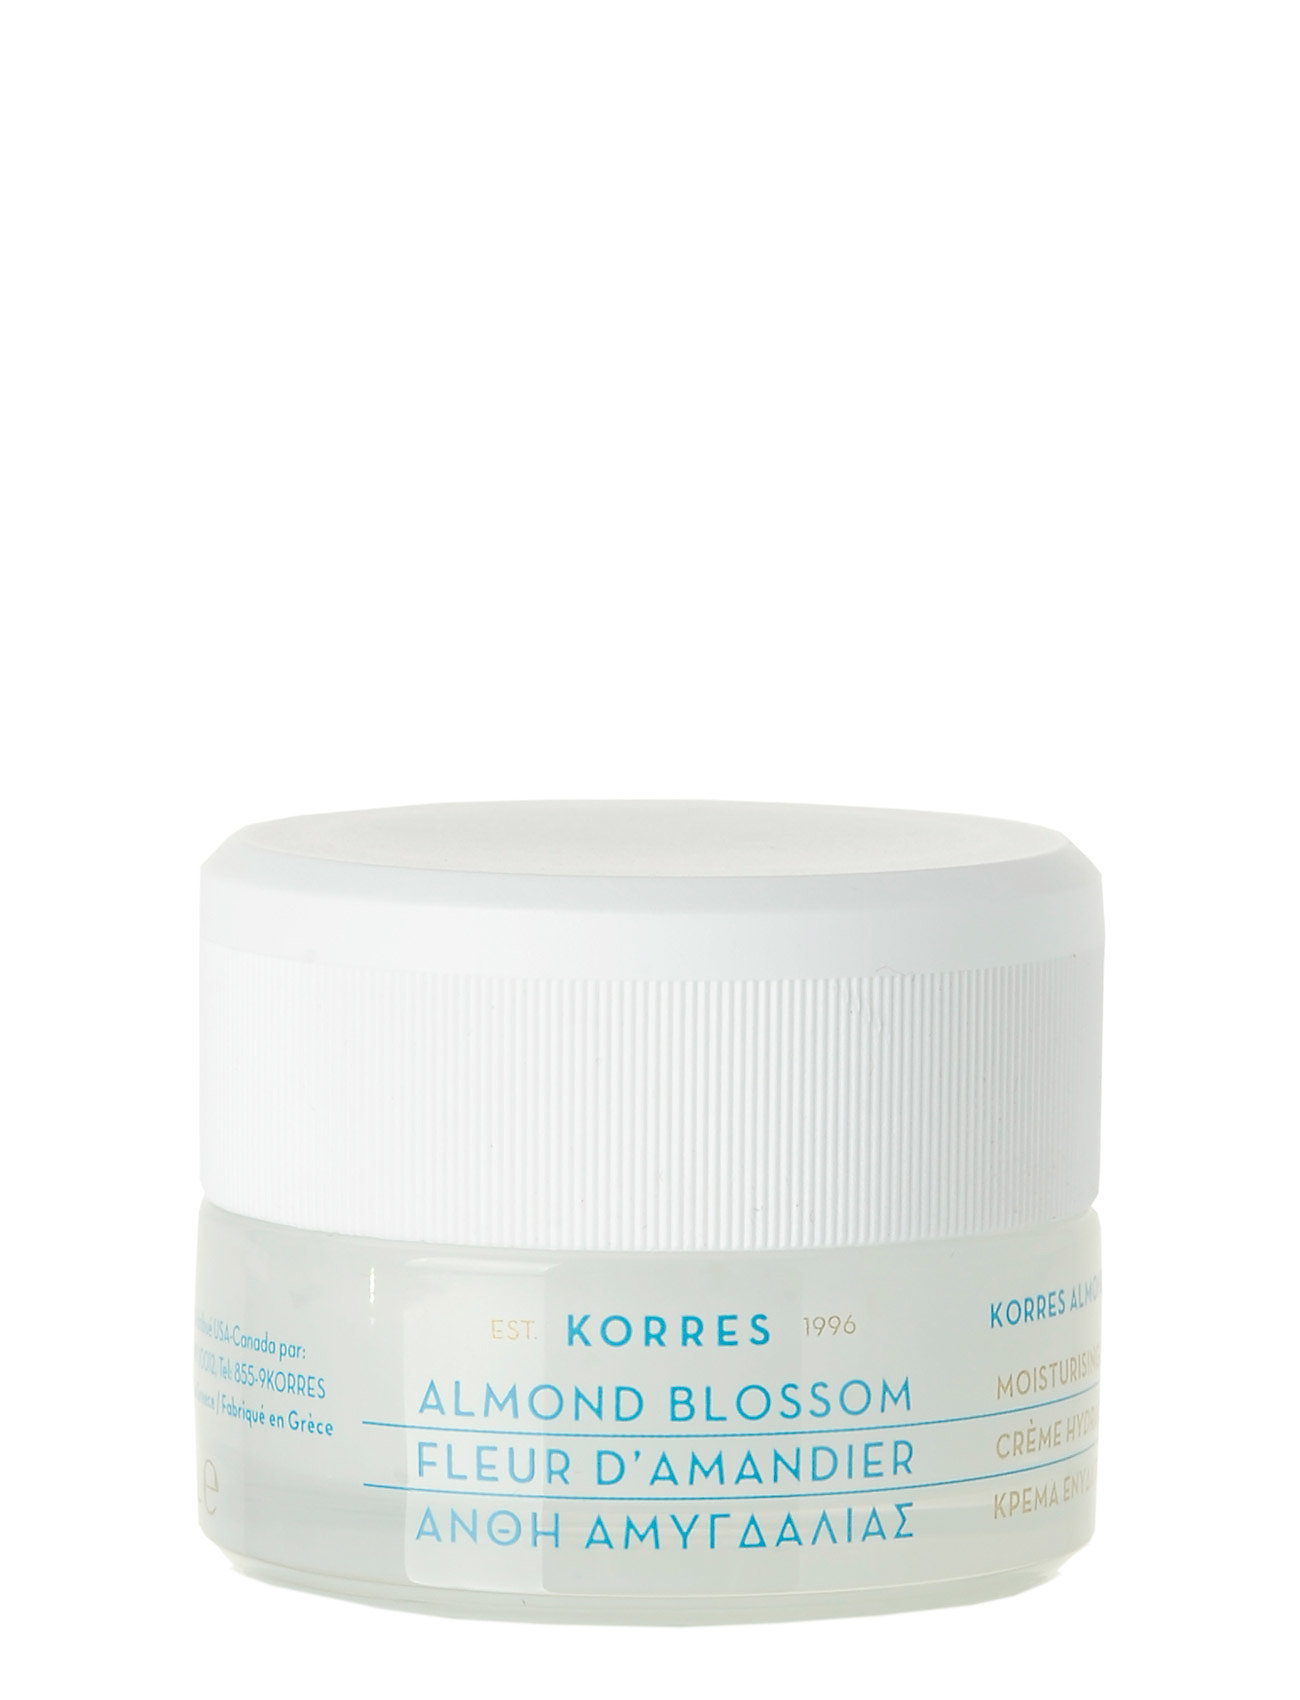 korres – Almond blossom day o-c 40 ml på boozt.com dk